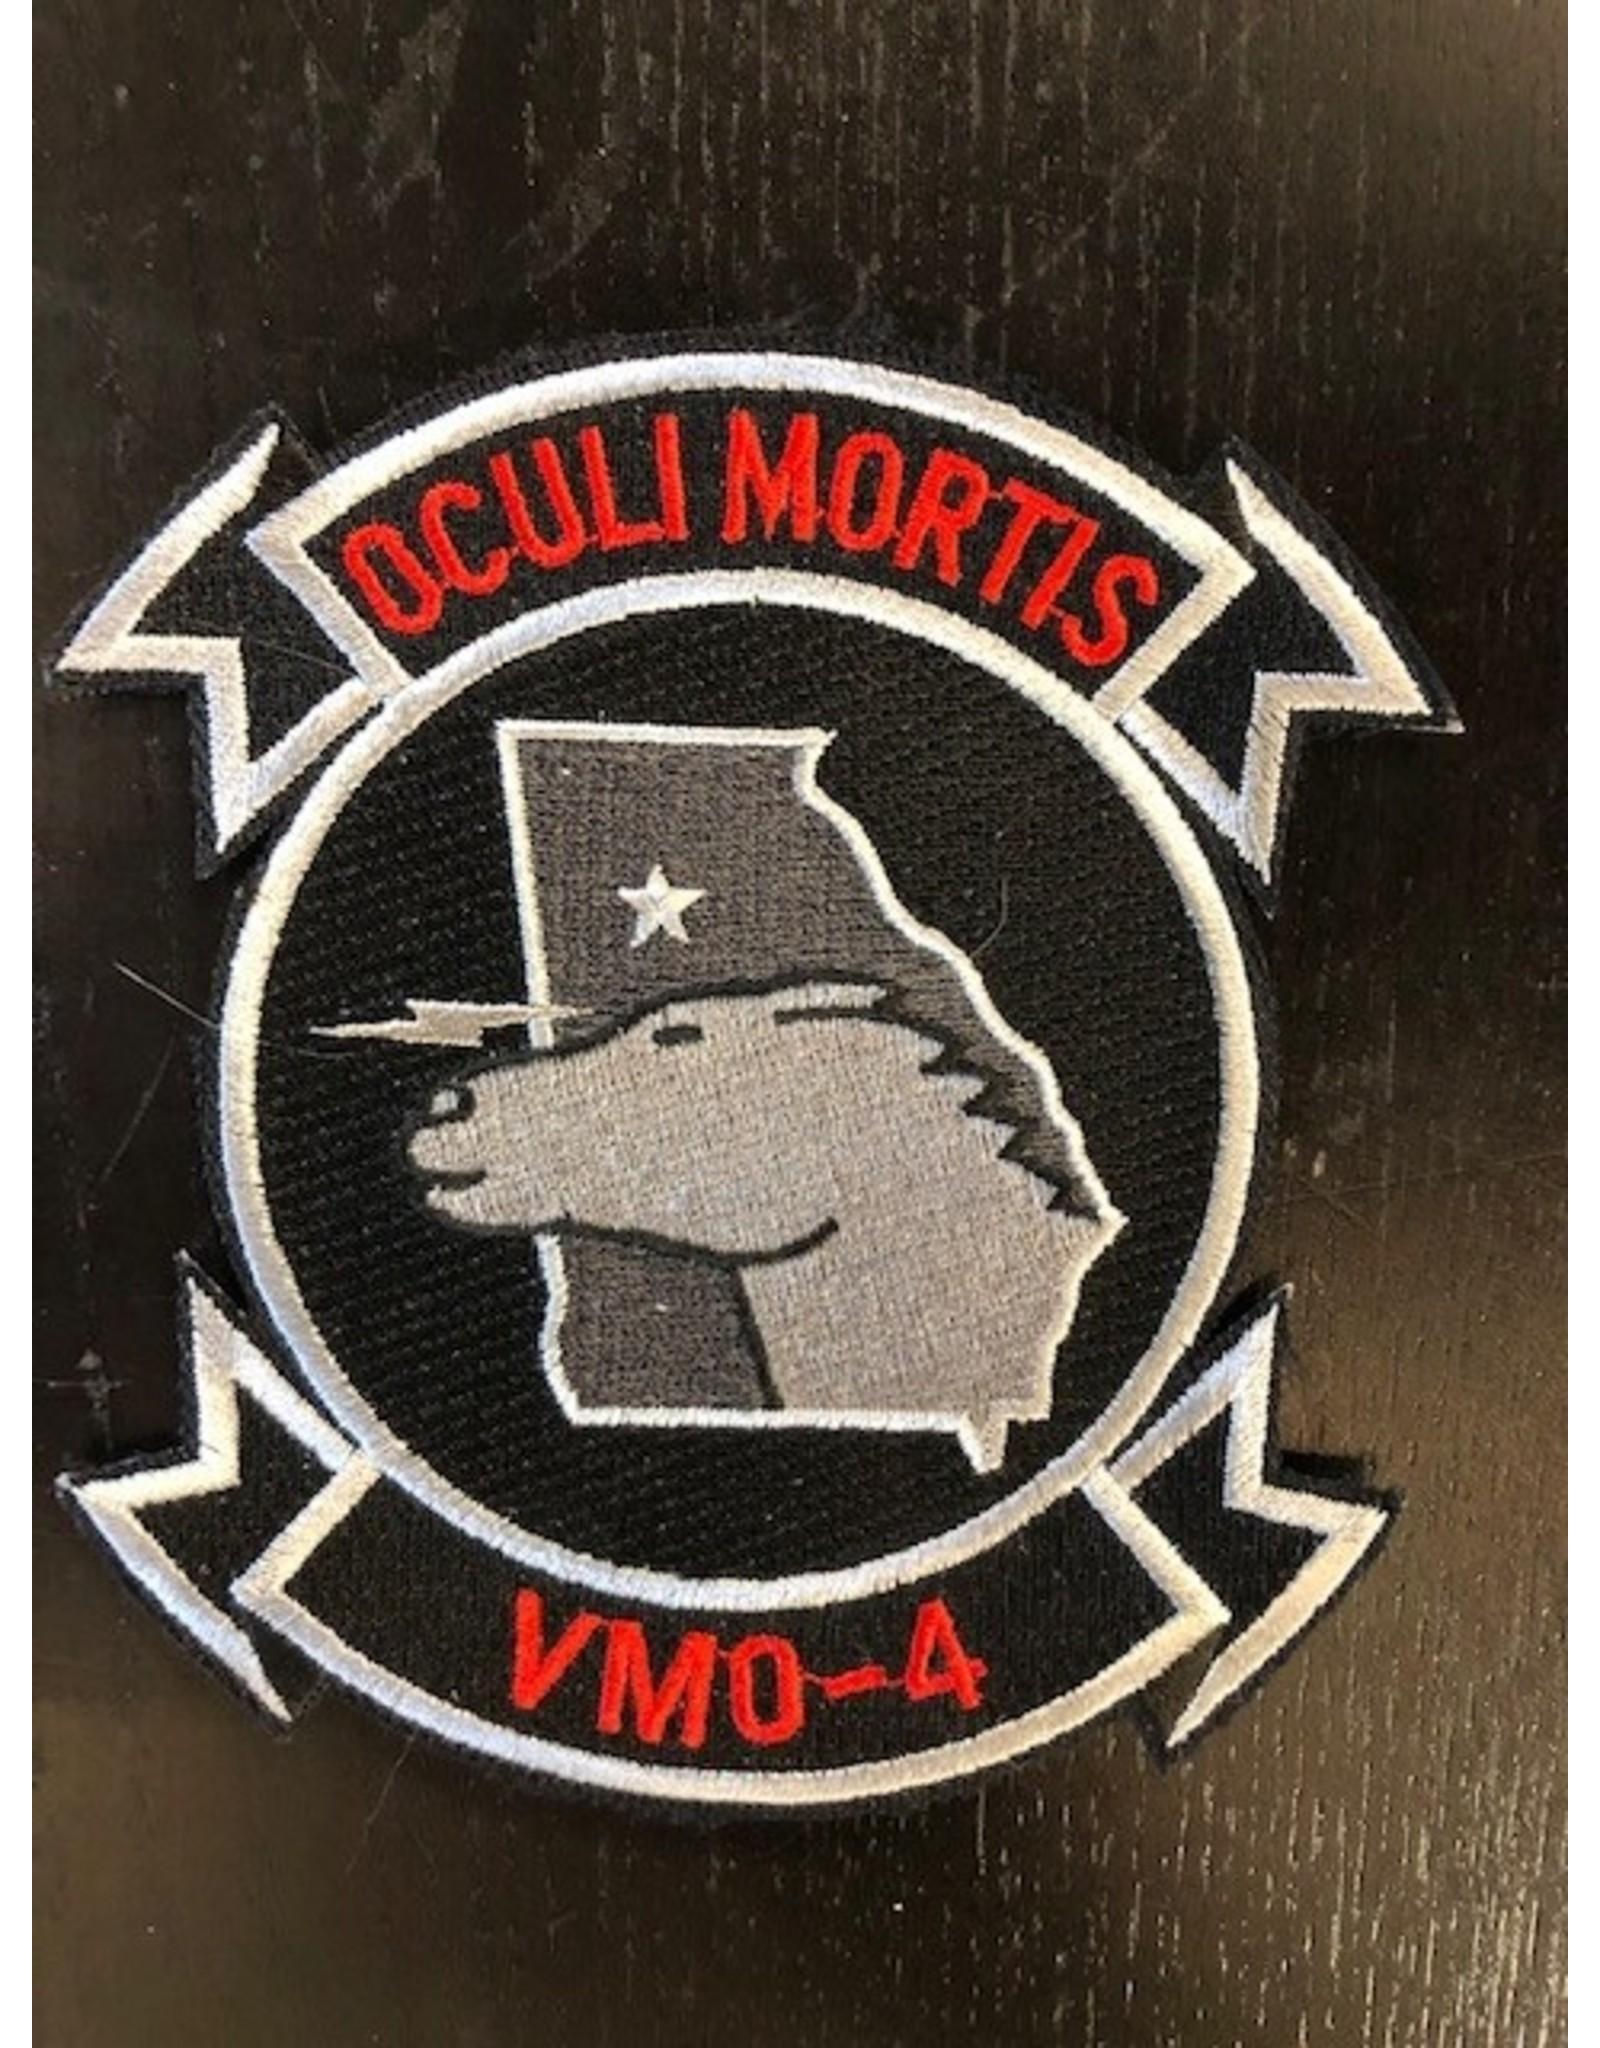 FWAM VMO-4 Oculi Mortis - Black (34), patch